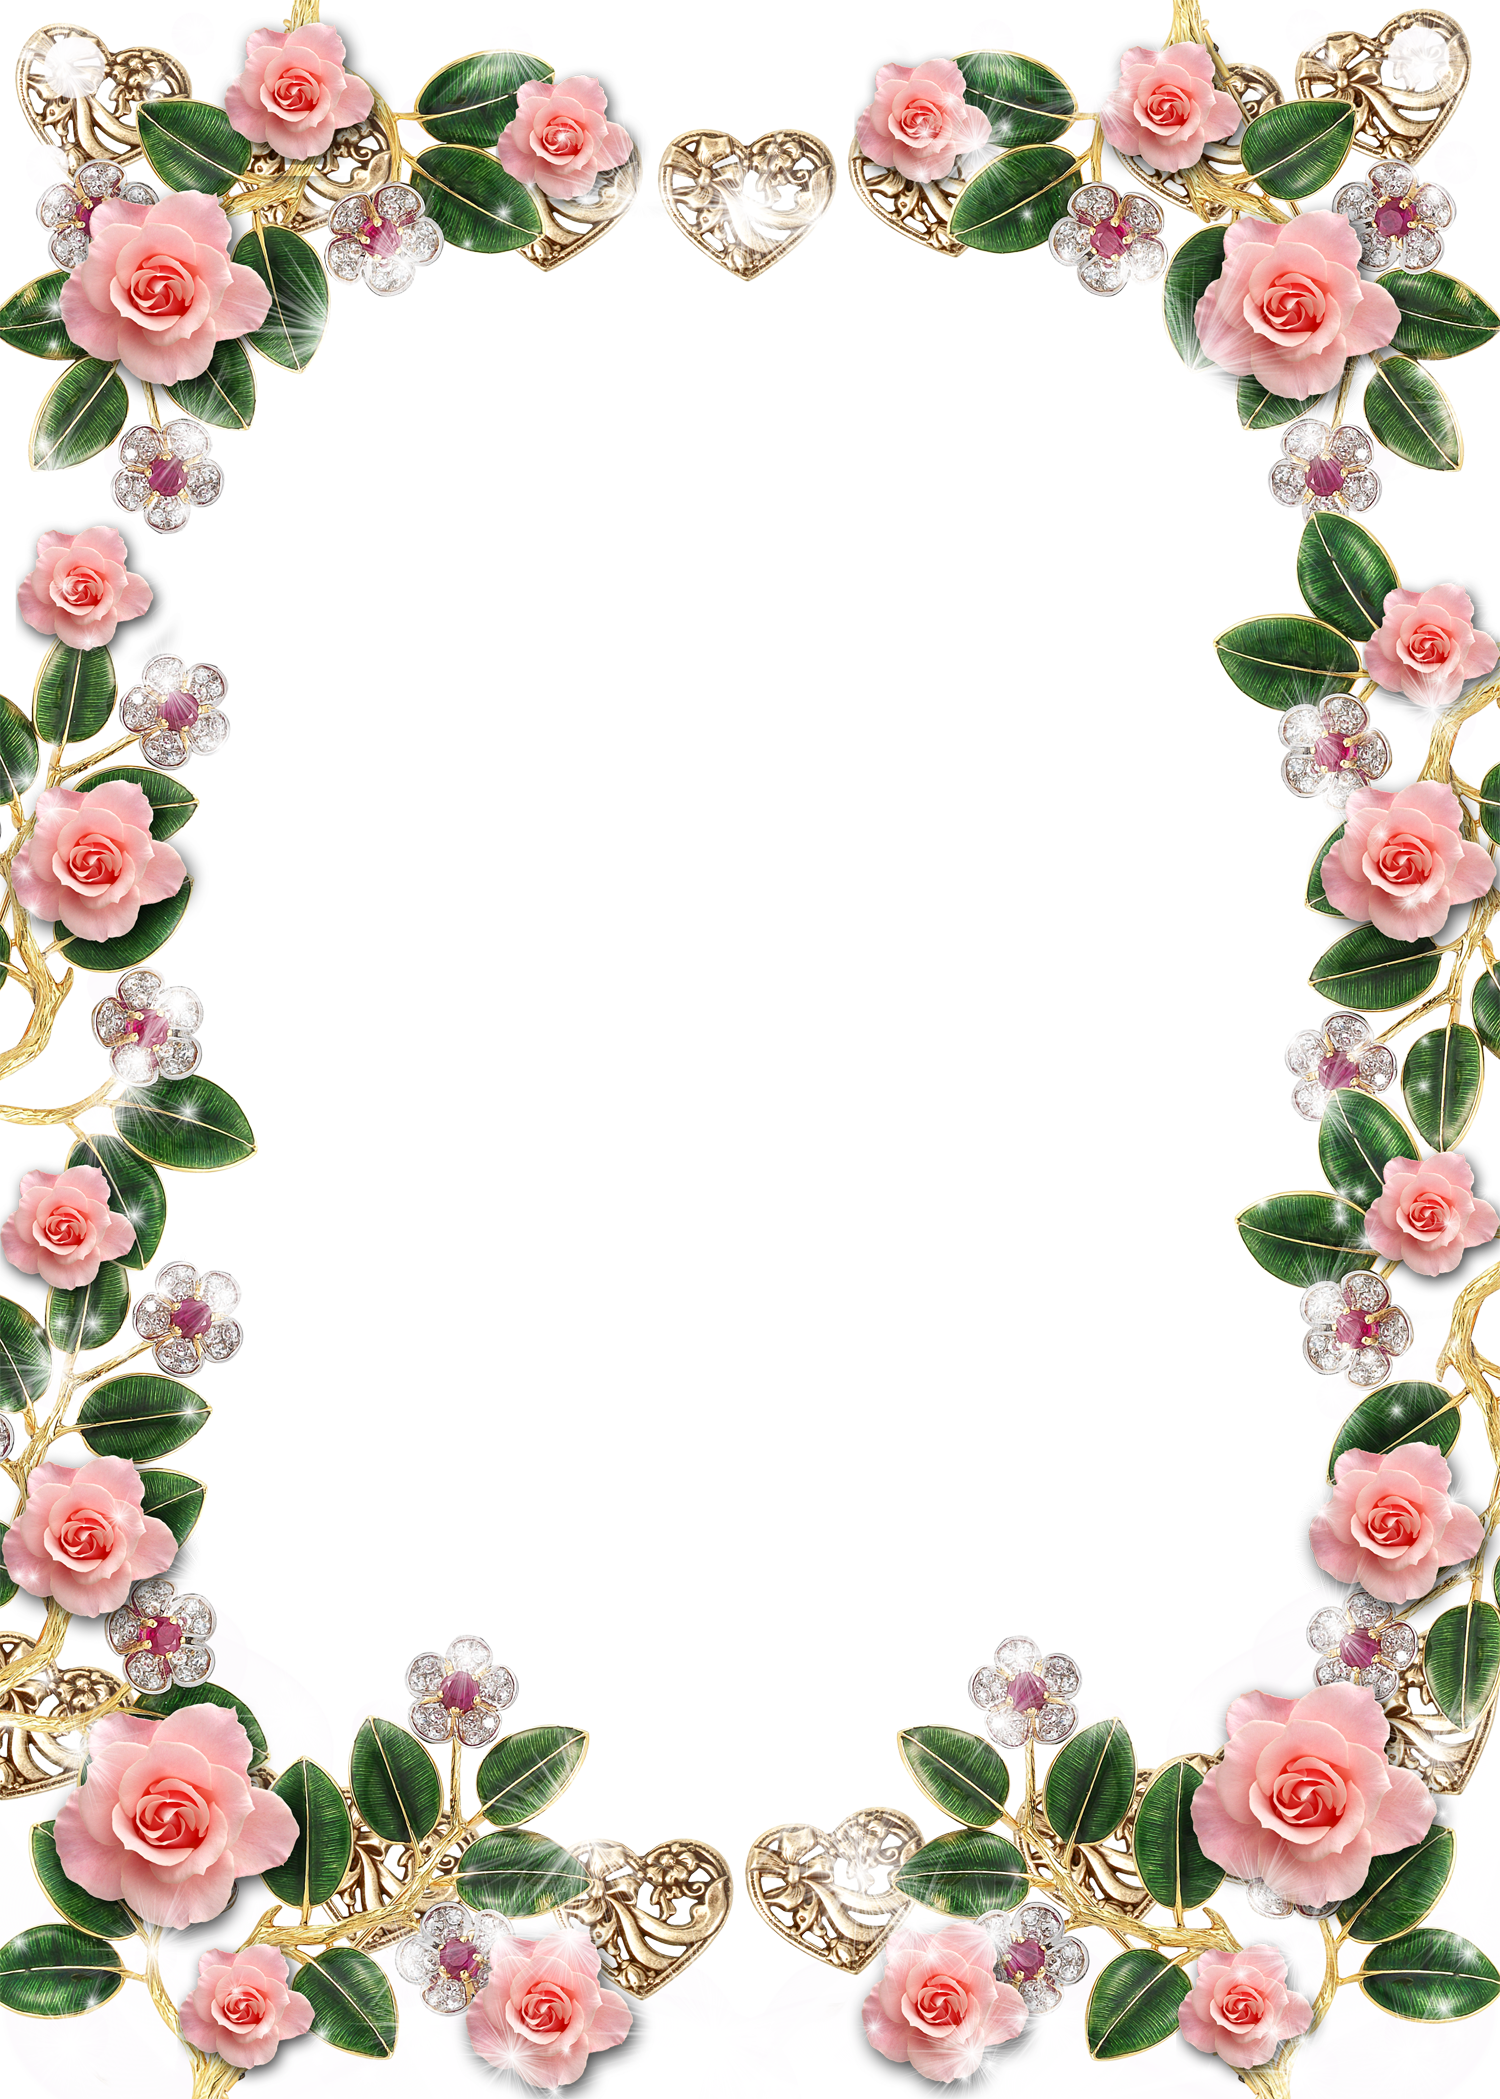 0_b5b25_19bc944c_orig (1500×2099) Floral border design